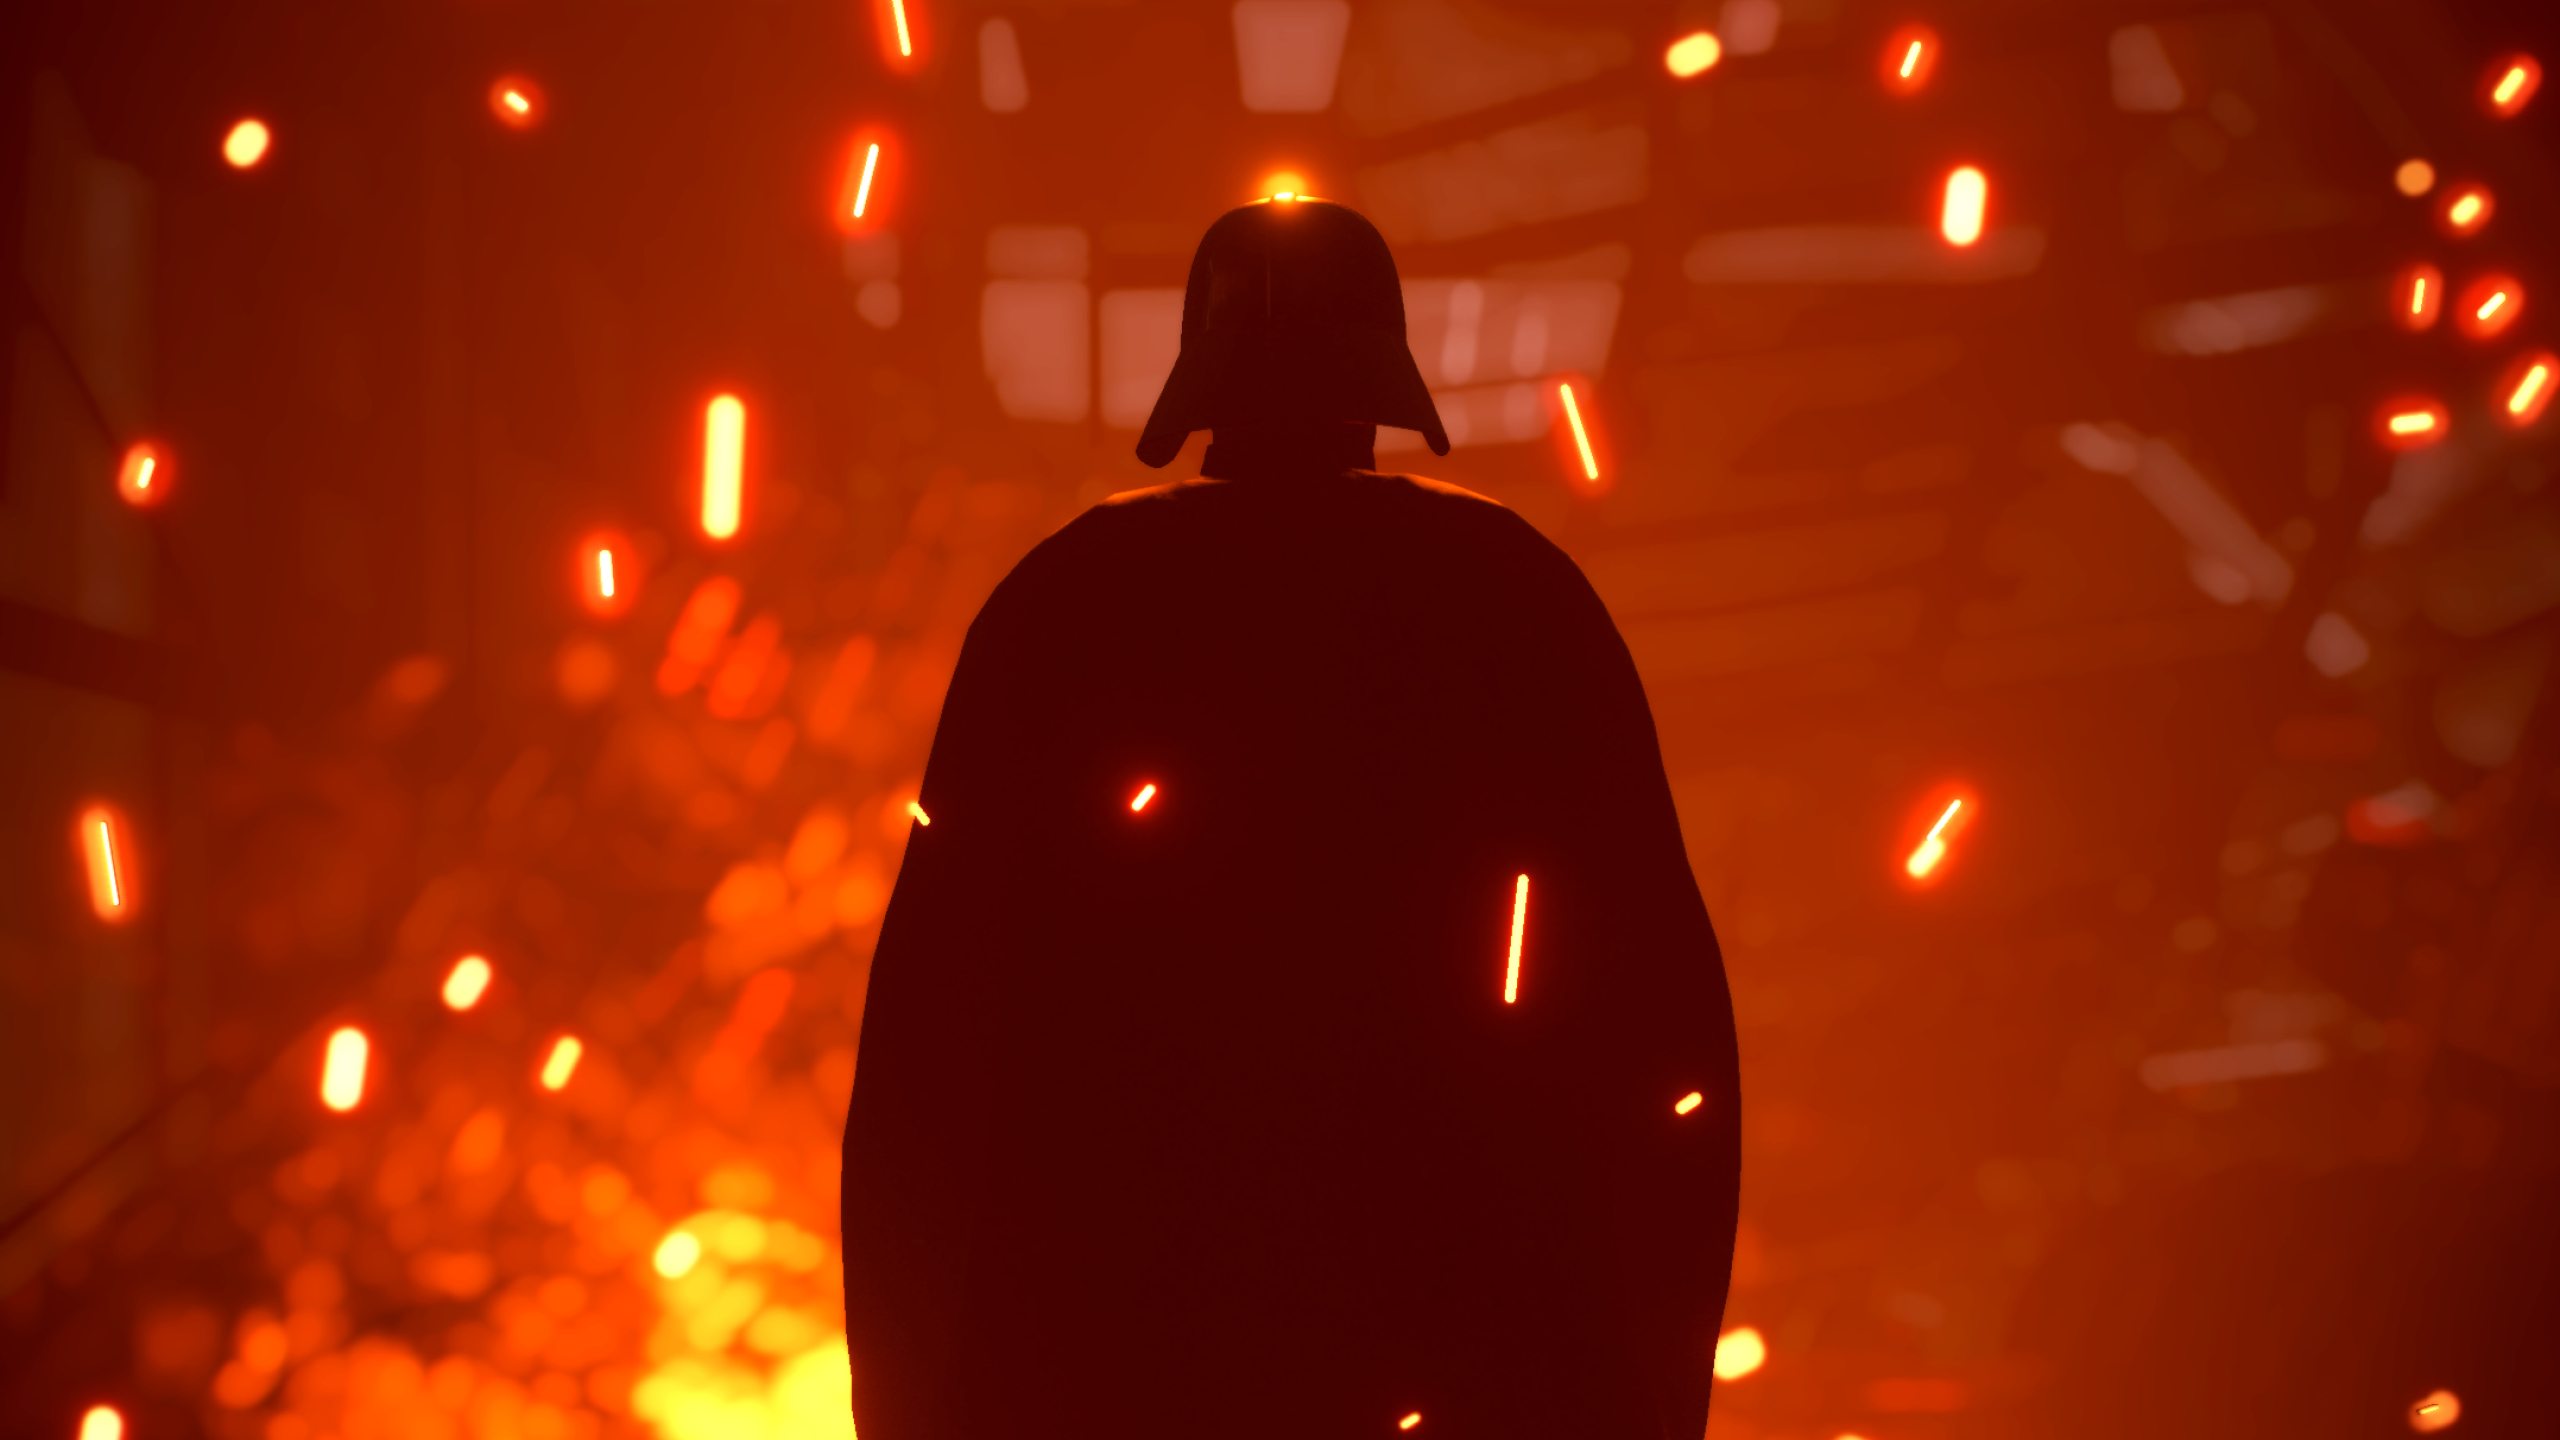 2560x1440 Darth Vader 1440p Resolution Wallpaper Hd Movies